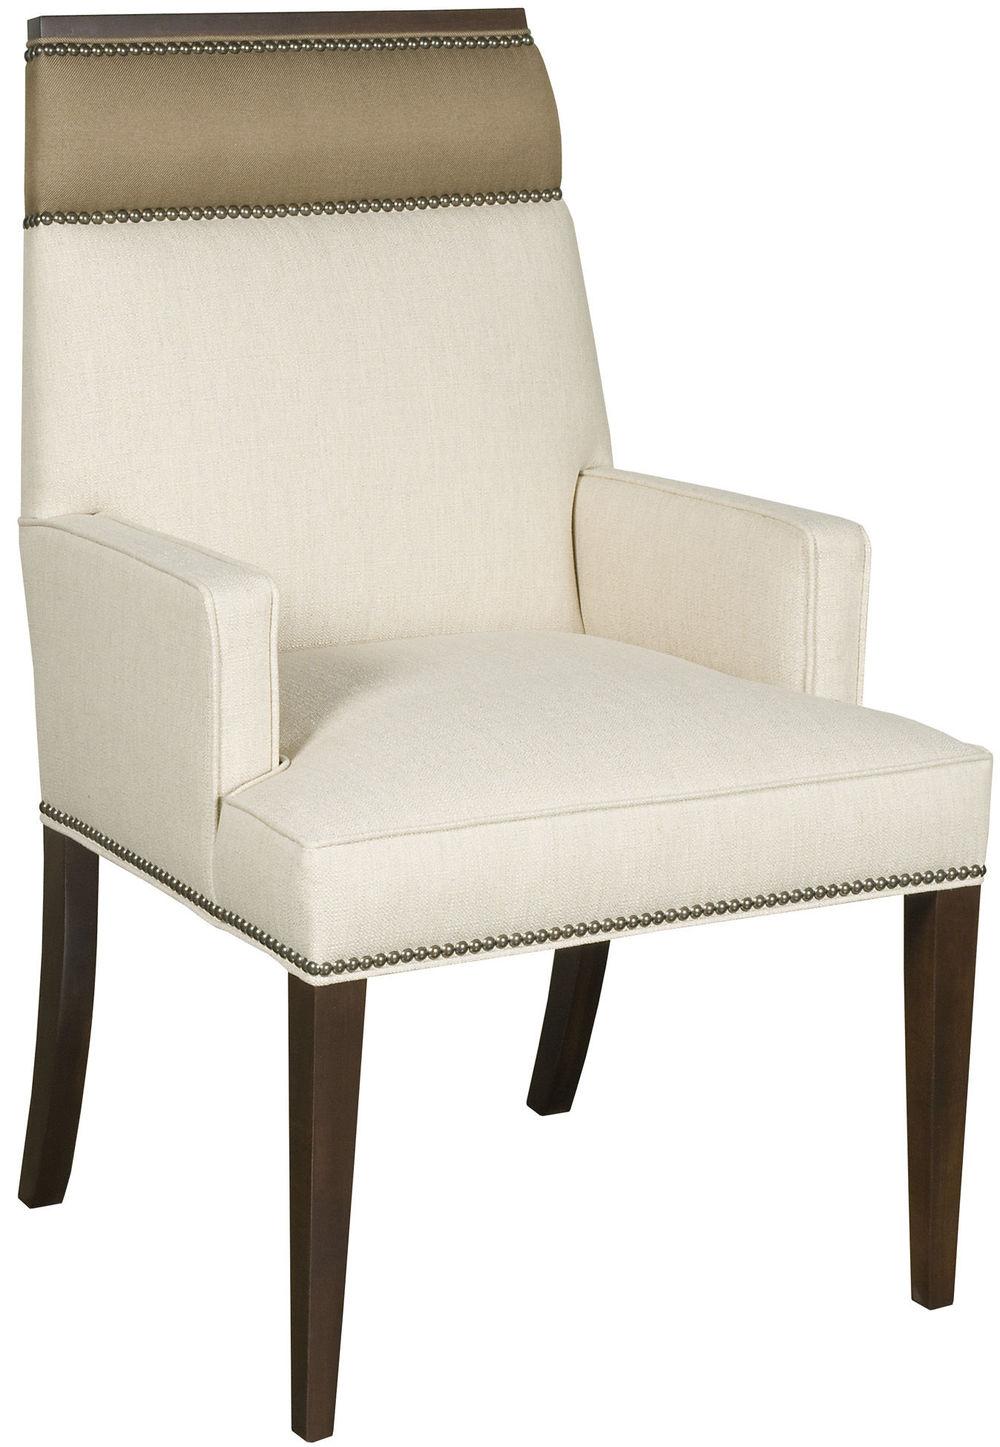 Vanguard Furniture - Phelps Arm Chair